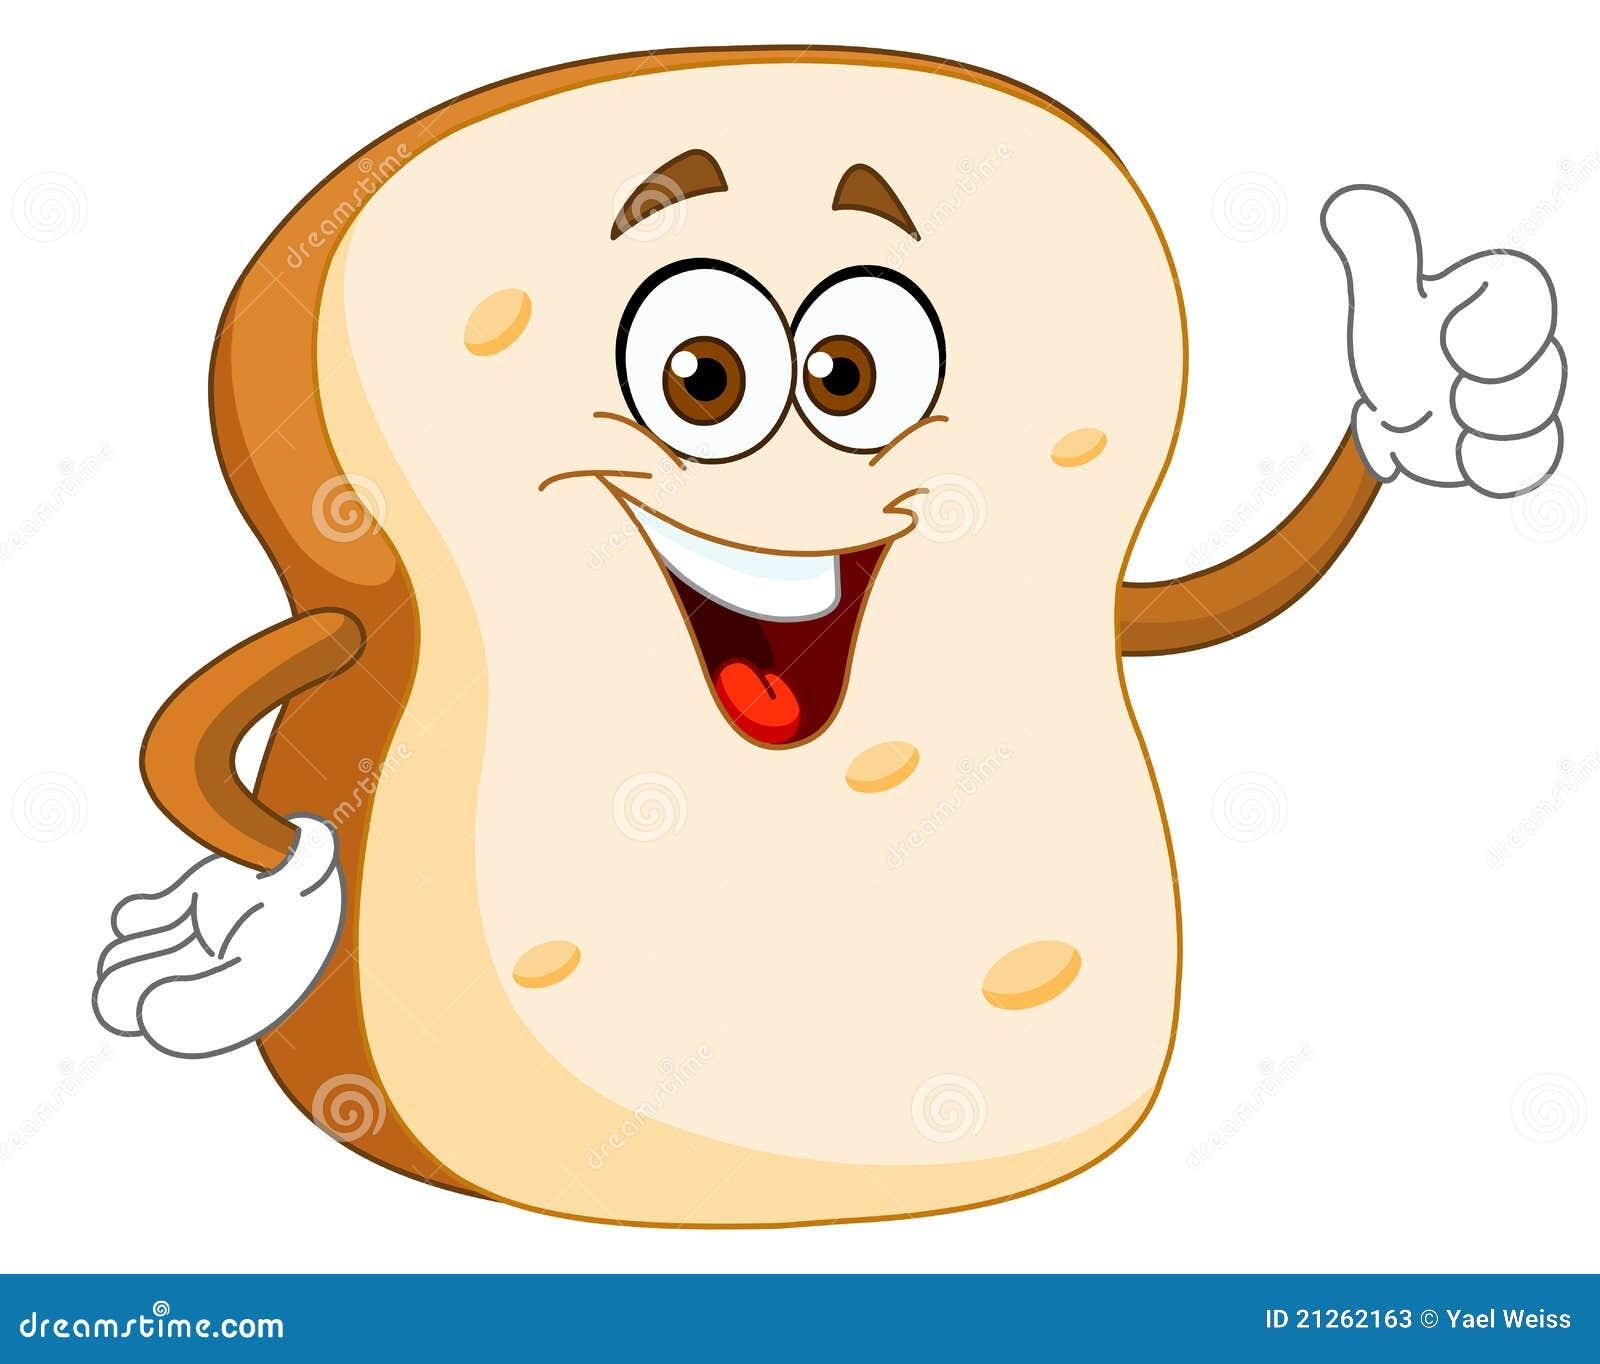 Bread Slice Cartoon Stock Photos - Image: 21262163